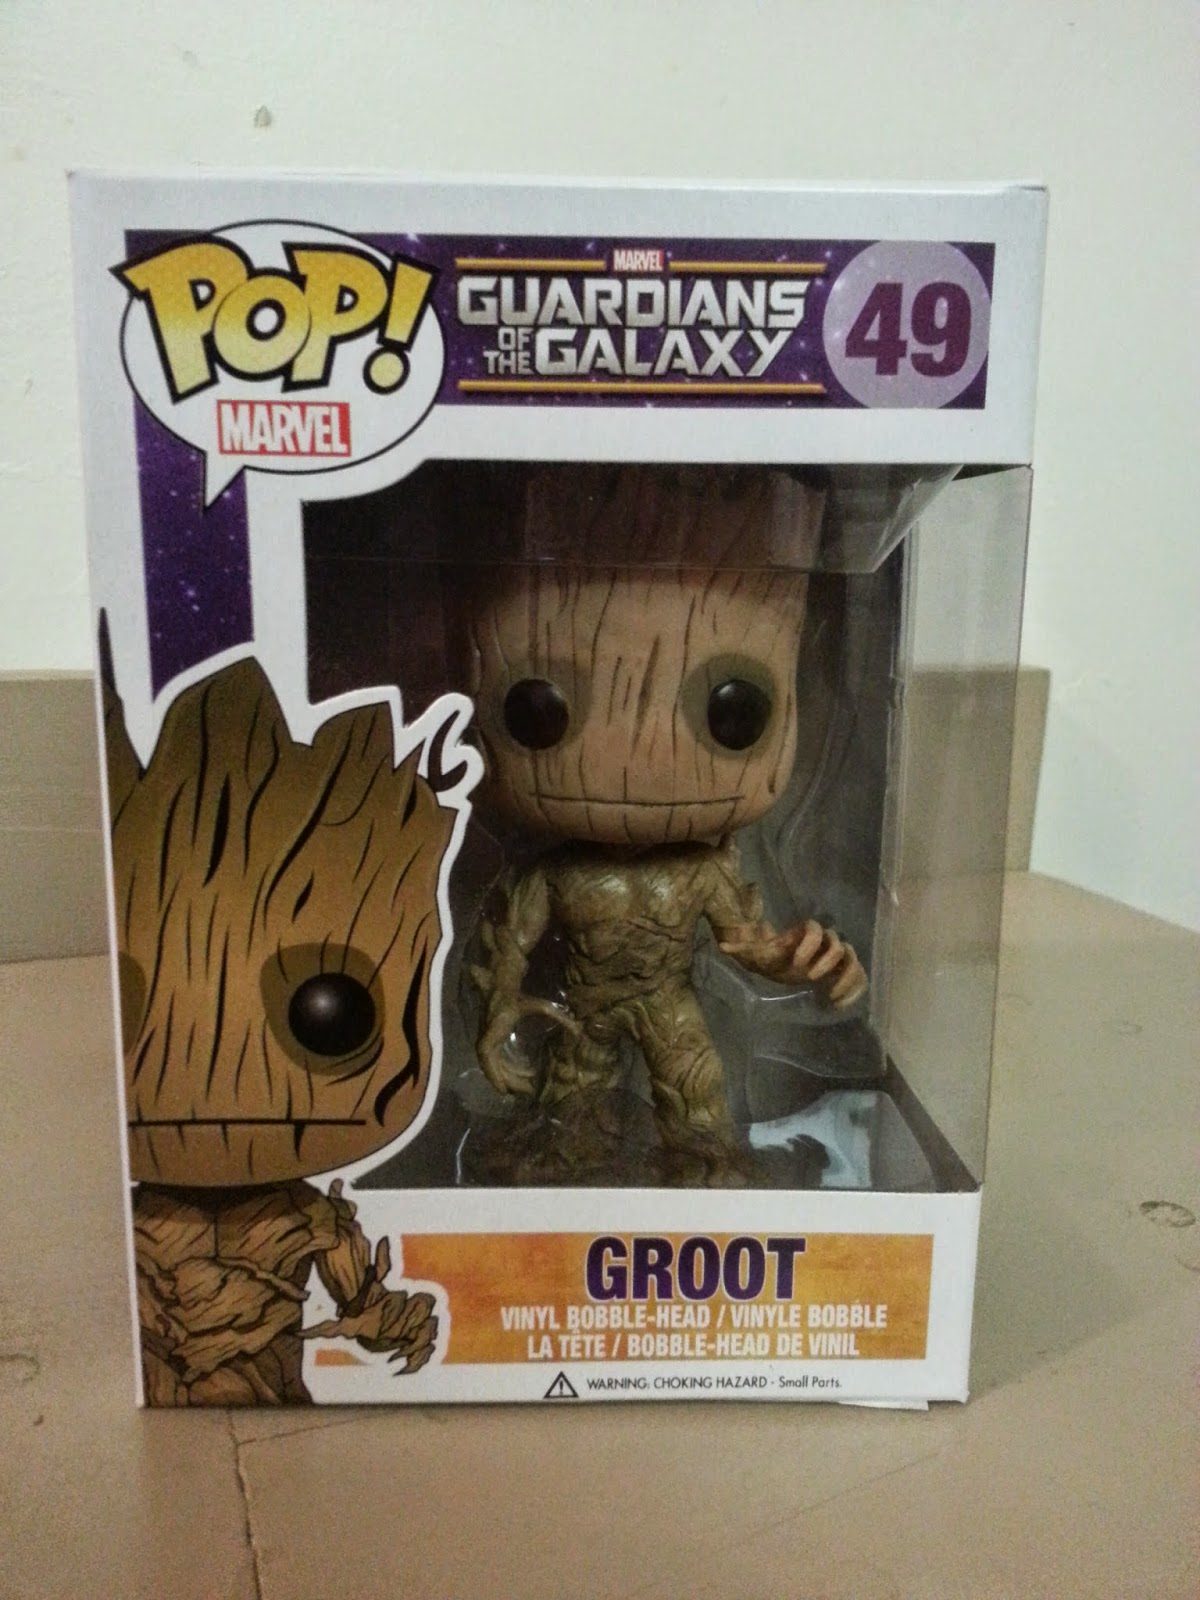 GROOT Guardians of the Galaxy Bobble Head Funko Pop Figure 3 Inch 2014